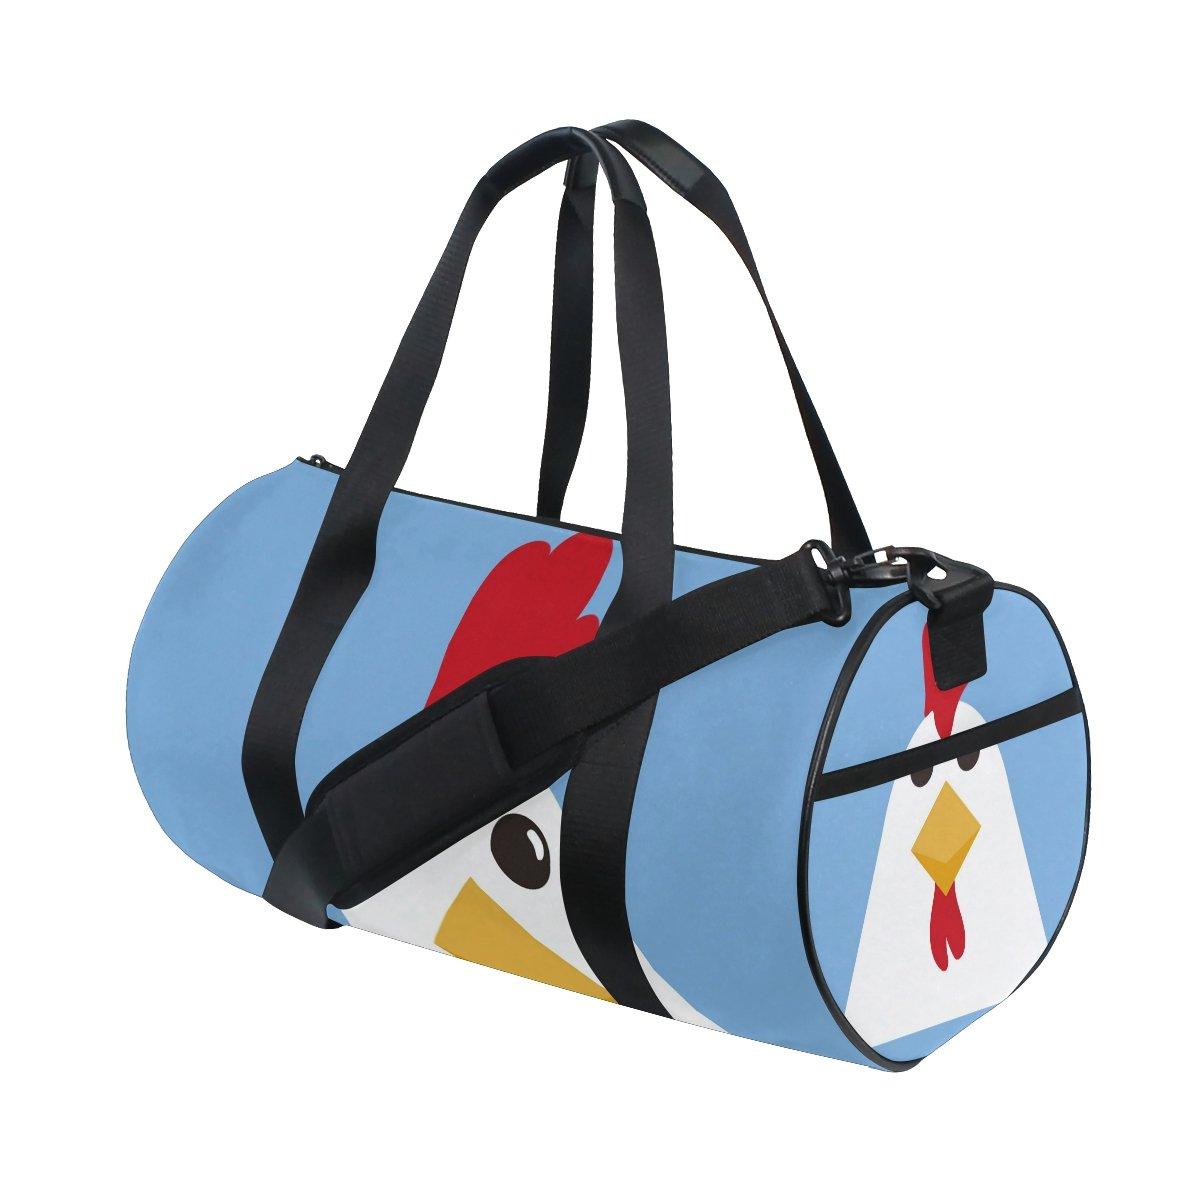 JIUMEI Cute White Chicken Farm Animal Lightweight Canvas Sports Bag Travel Duffel Yoga Gym Bags Shoulder Bag for Women Men Girls Boys